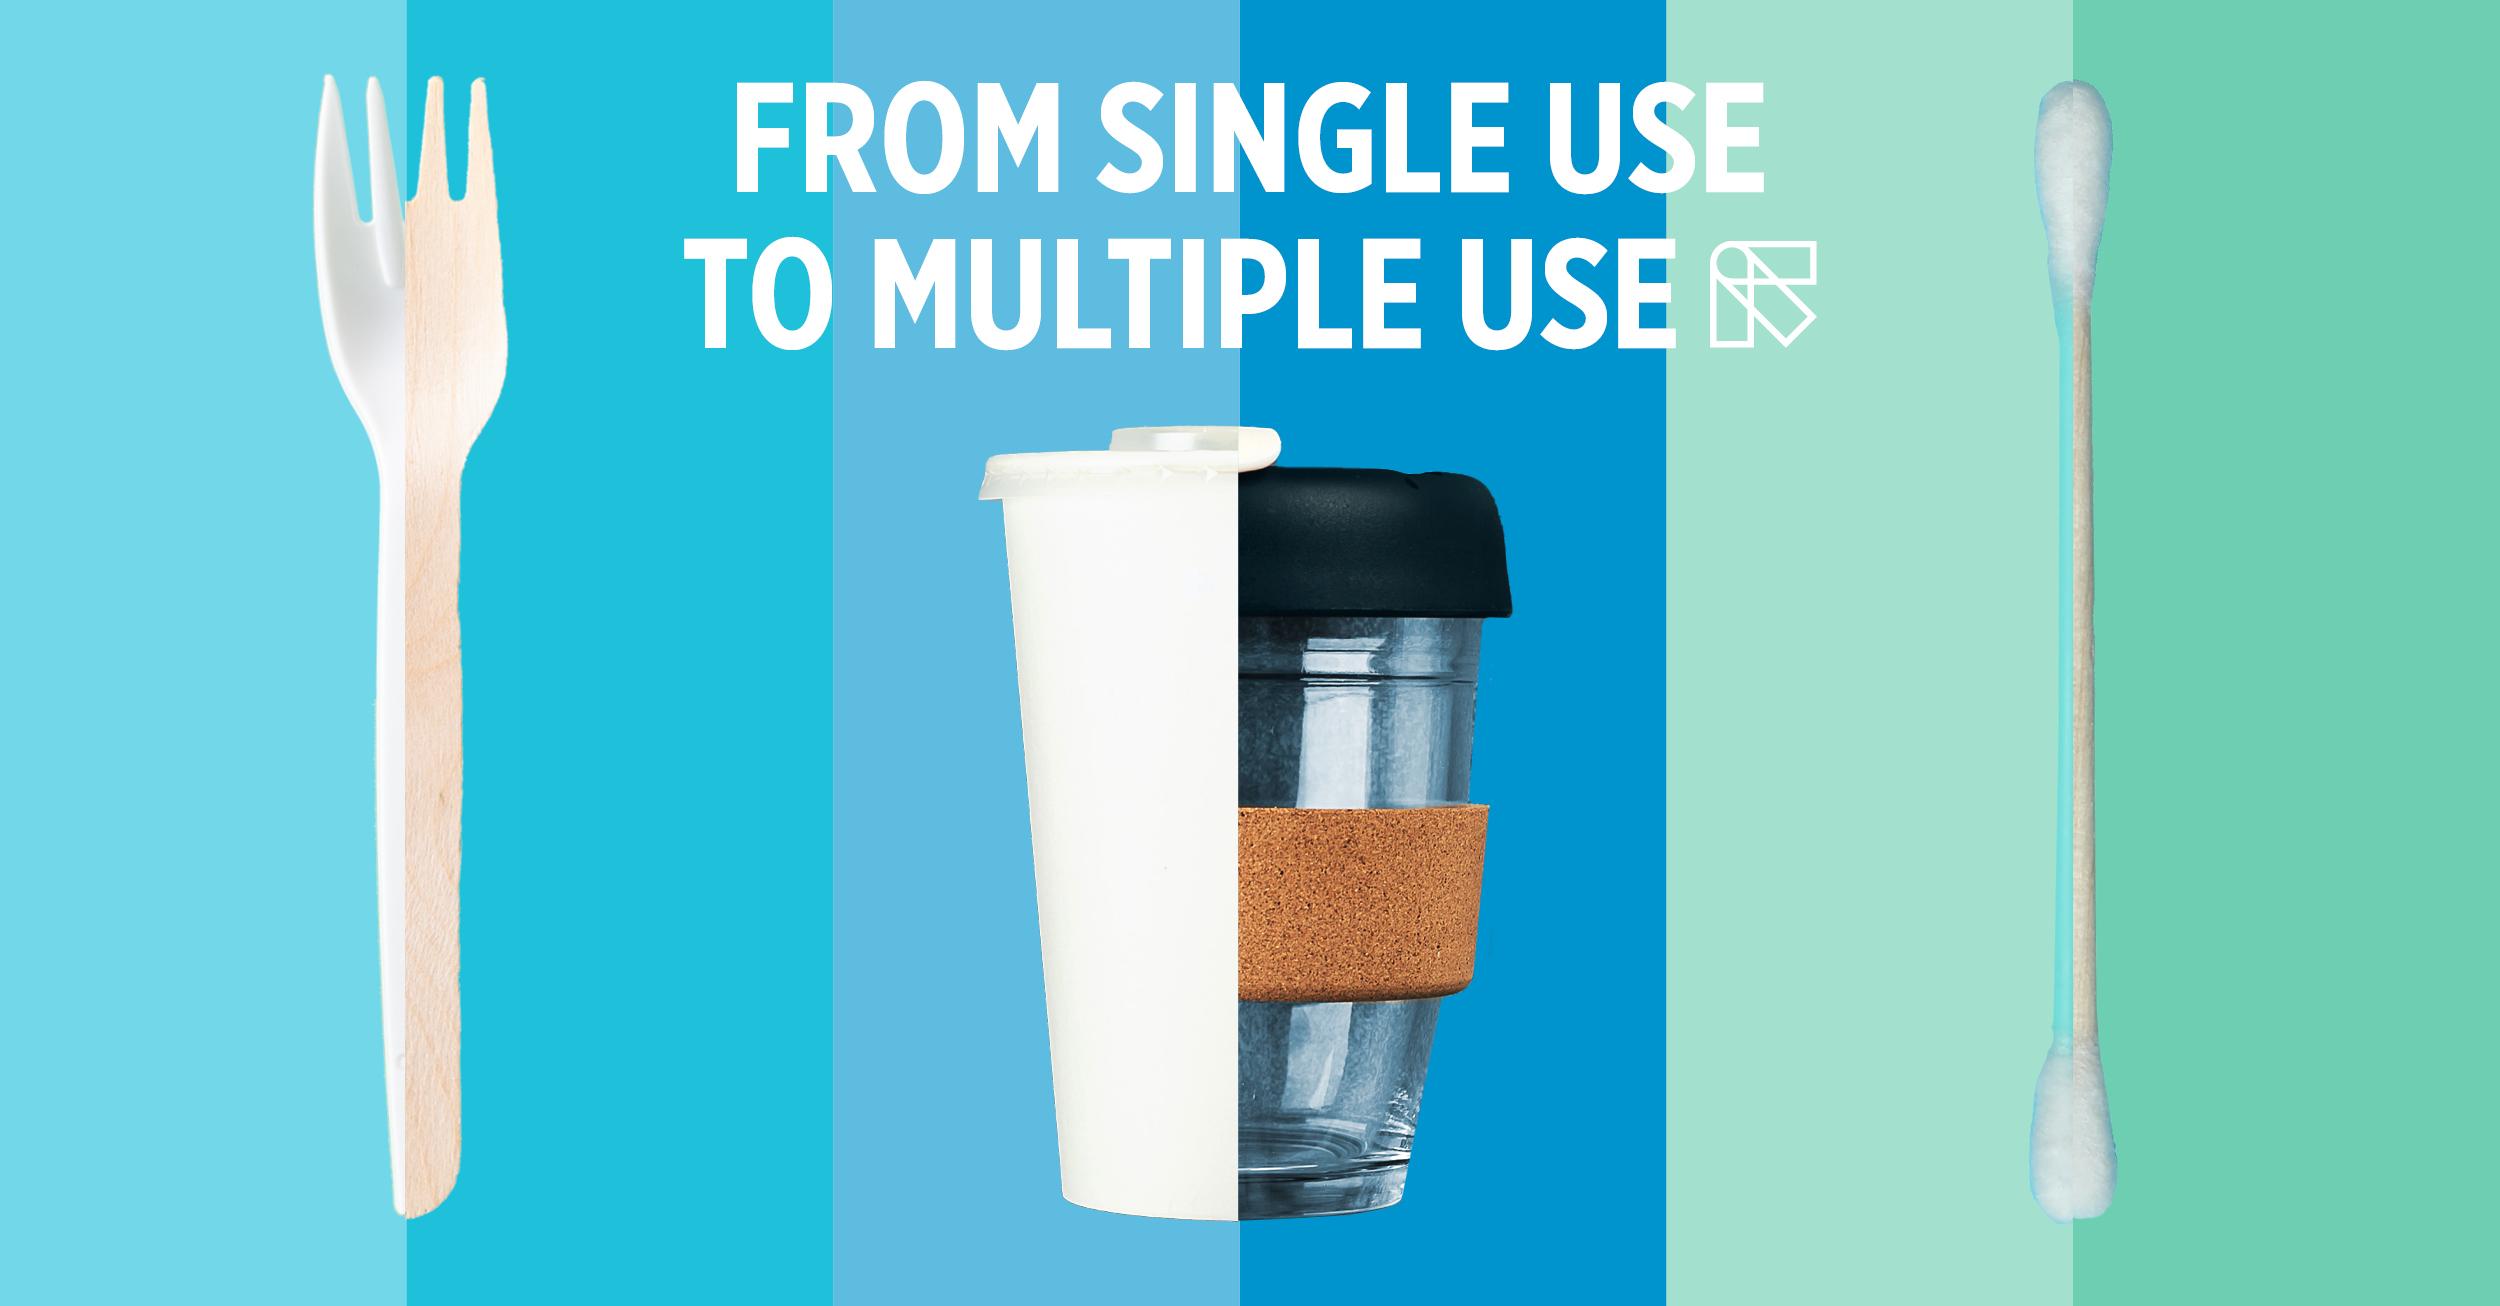 Post_Single_Use_Plastic_Ban_1200x627_v2